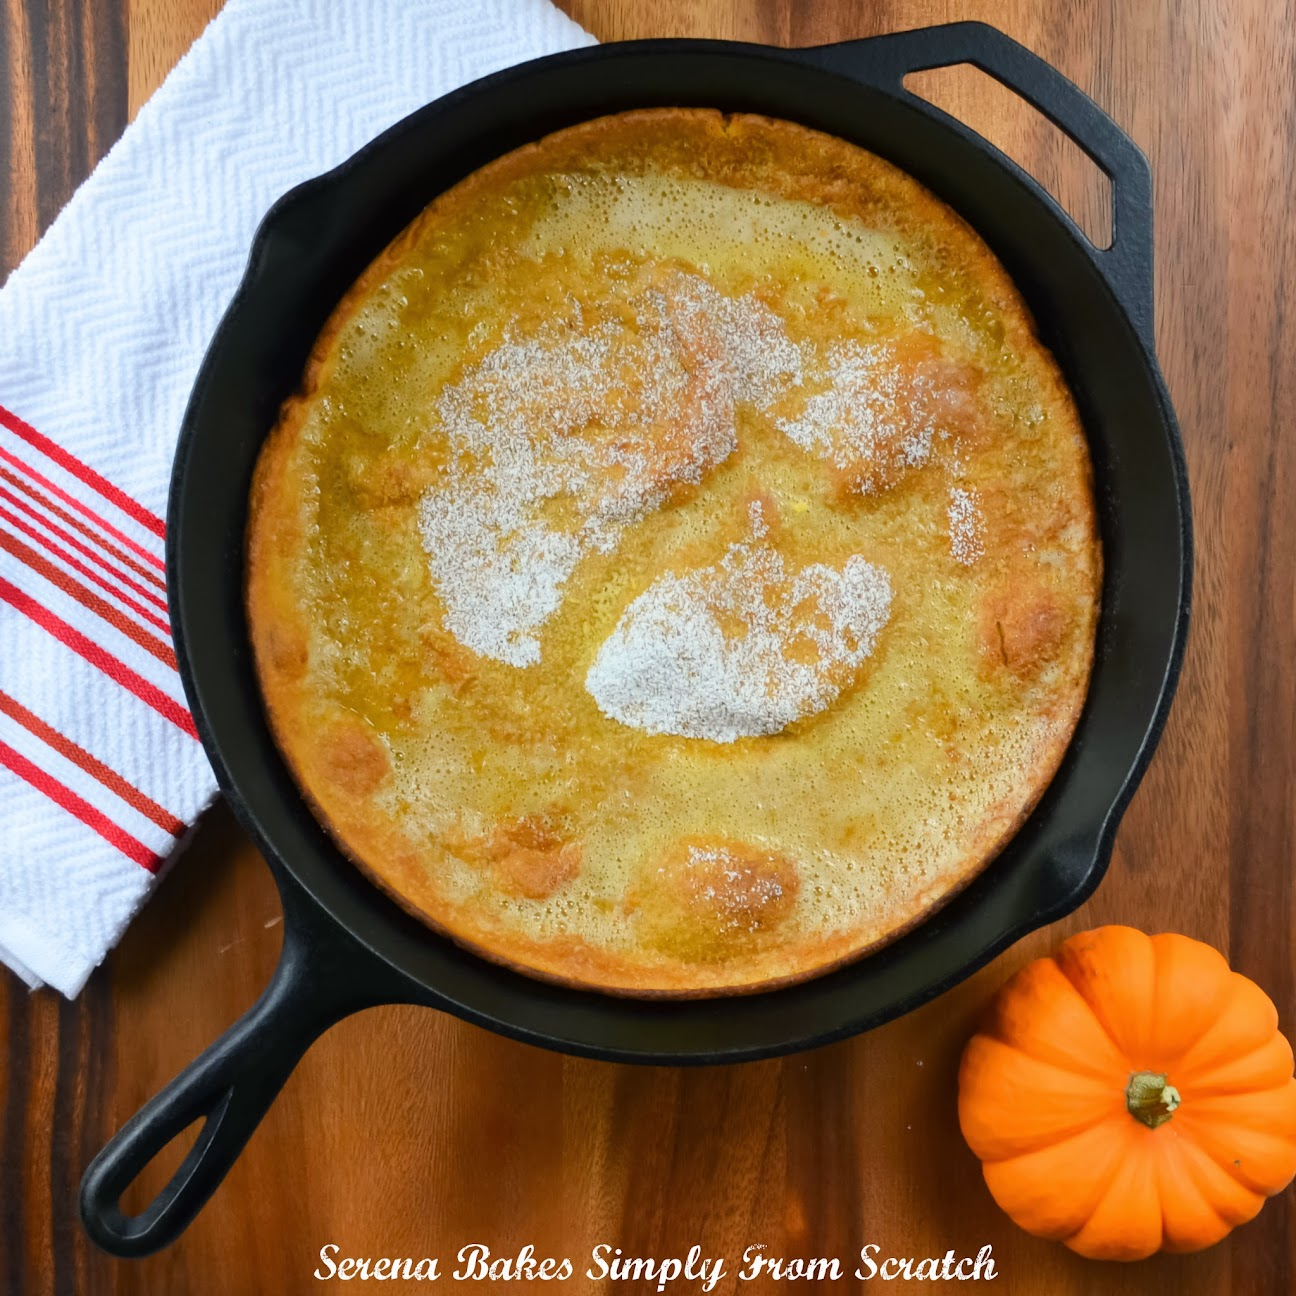 Pumpkin-Puff-Pancake.jpg